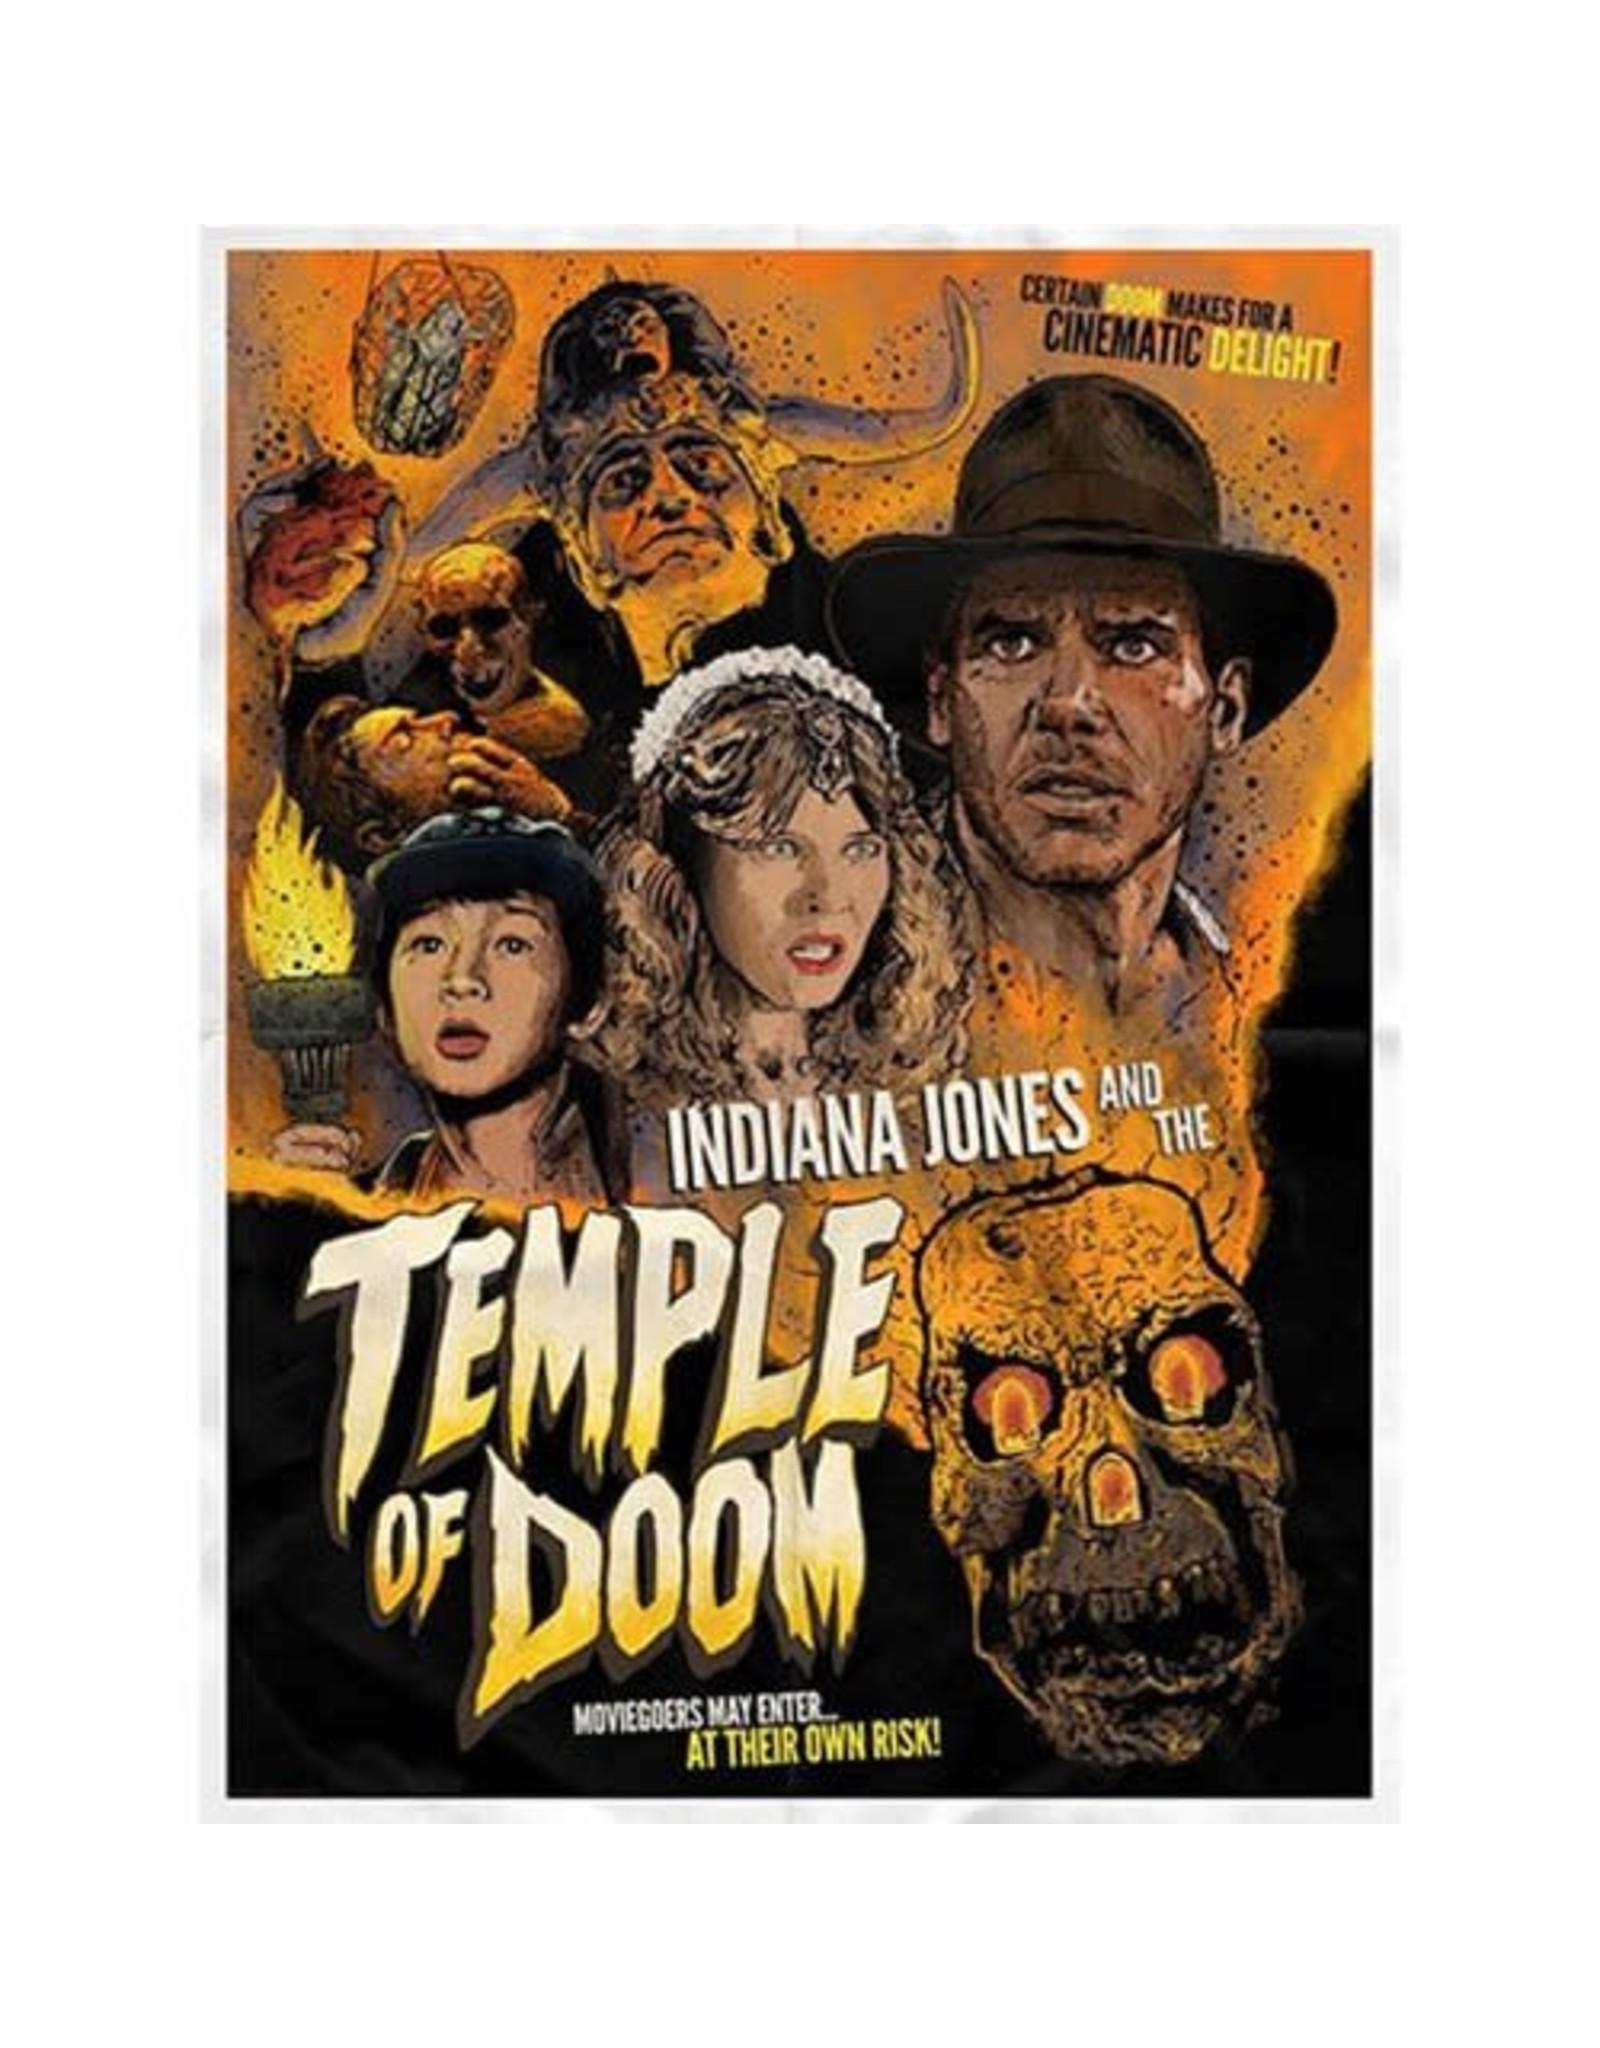 ACME Archives Indiana Jones Certain Doom by J.J. Lendl Lithograph Art Print